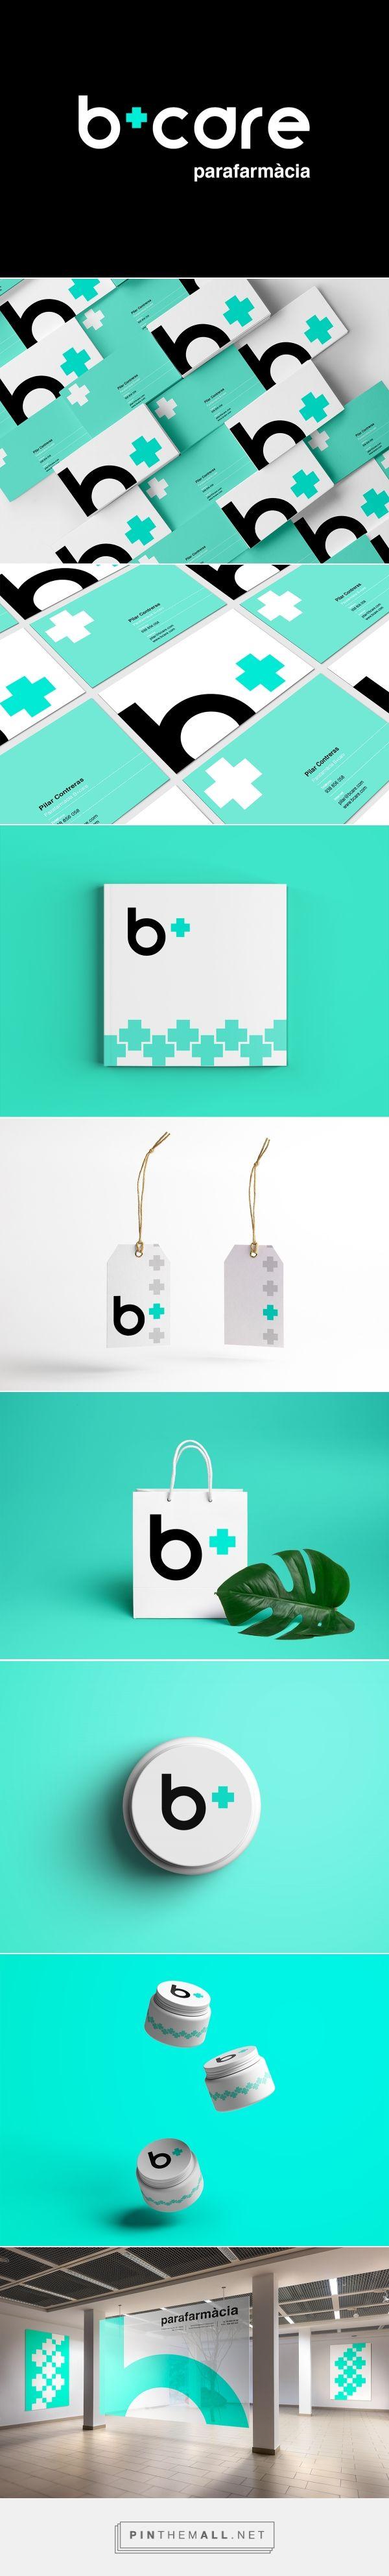 B+CARE Pharmacy Branding by Xavier Esclusa Trias   Fivestar Branding Agency – Design and Branding Agency & Curated Inspiration Gallery